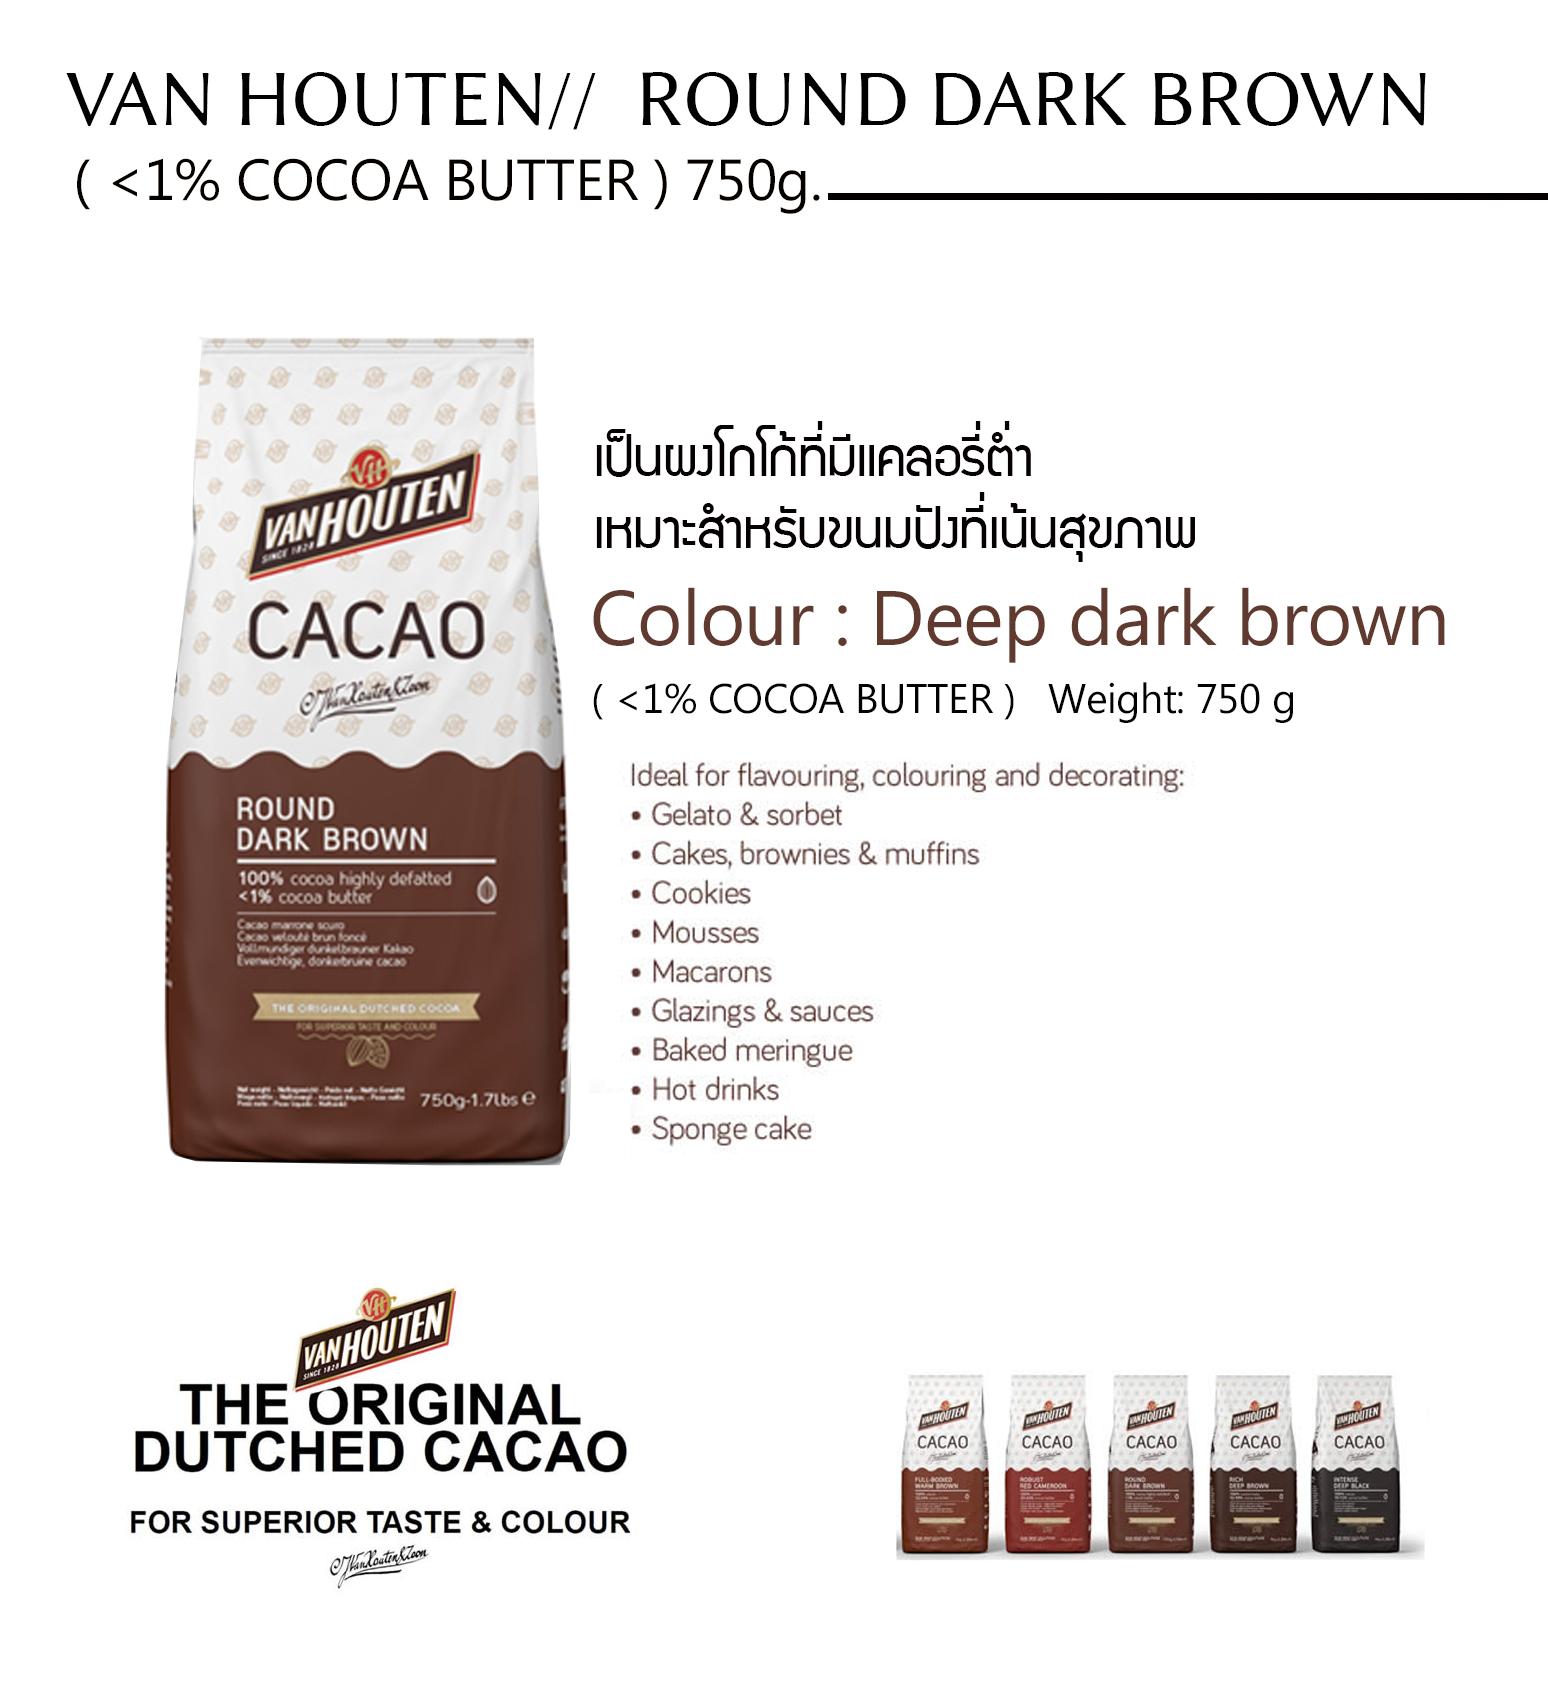 VAN HOUTEN ROUND DARK BROWN ( <1% COCOA BUTTER ) 750 g